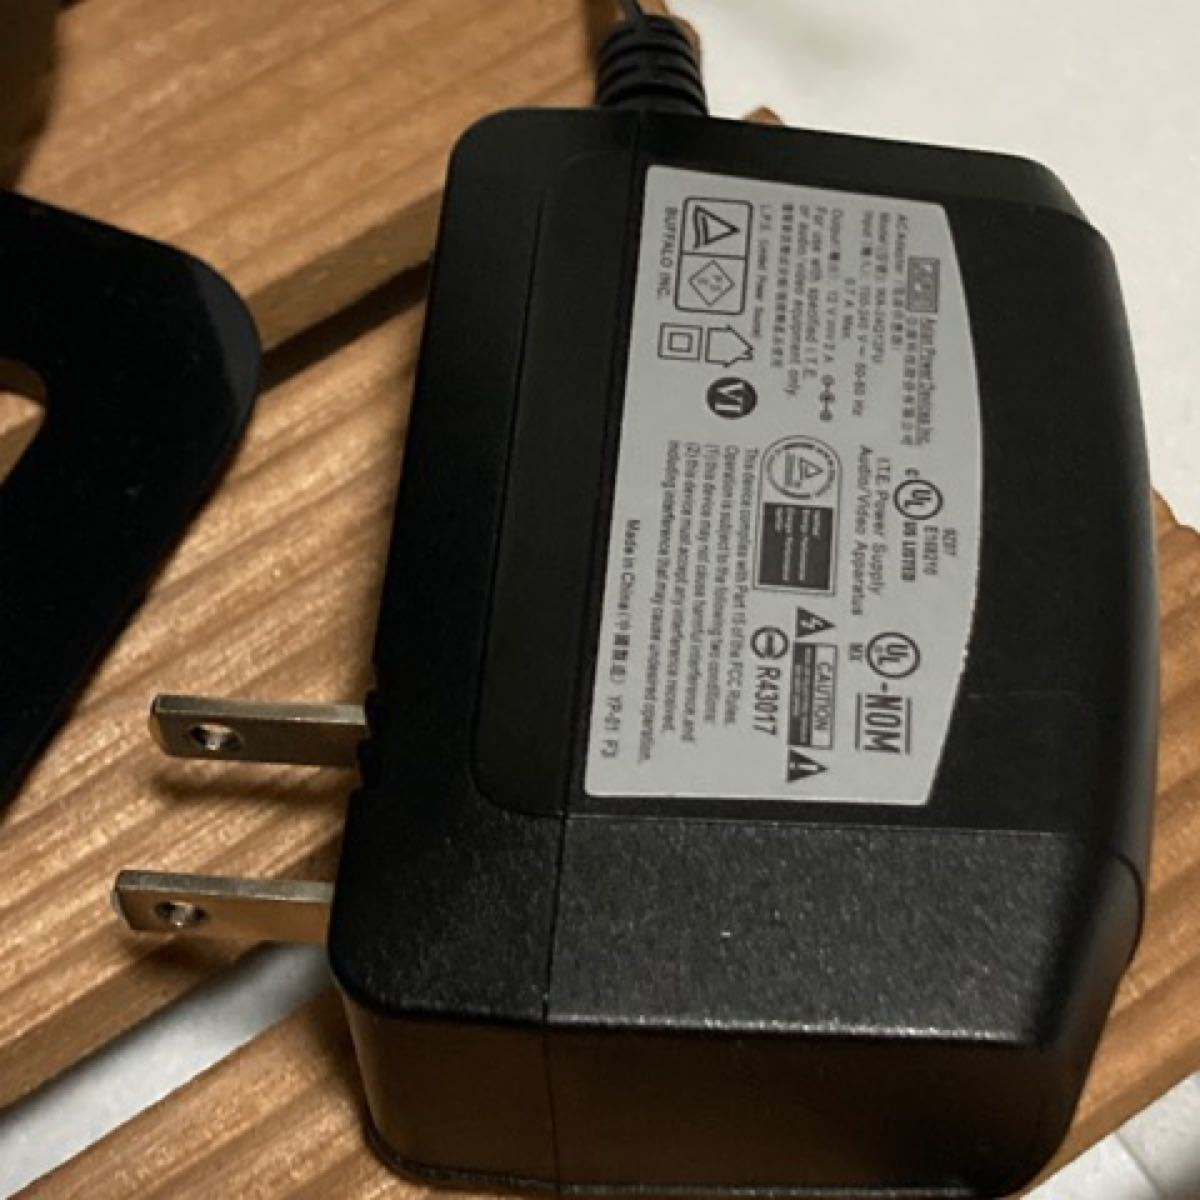 無線ルーター BUFFALO WXR-1750DHP2 WiFi 無線LAN